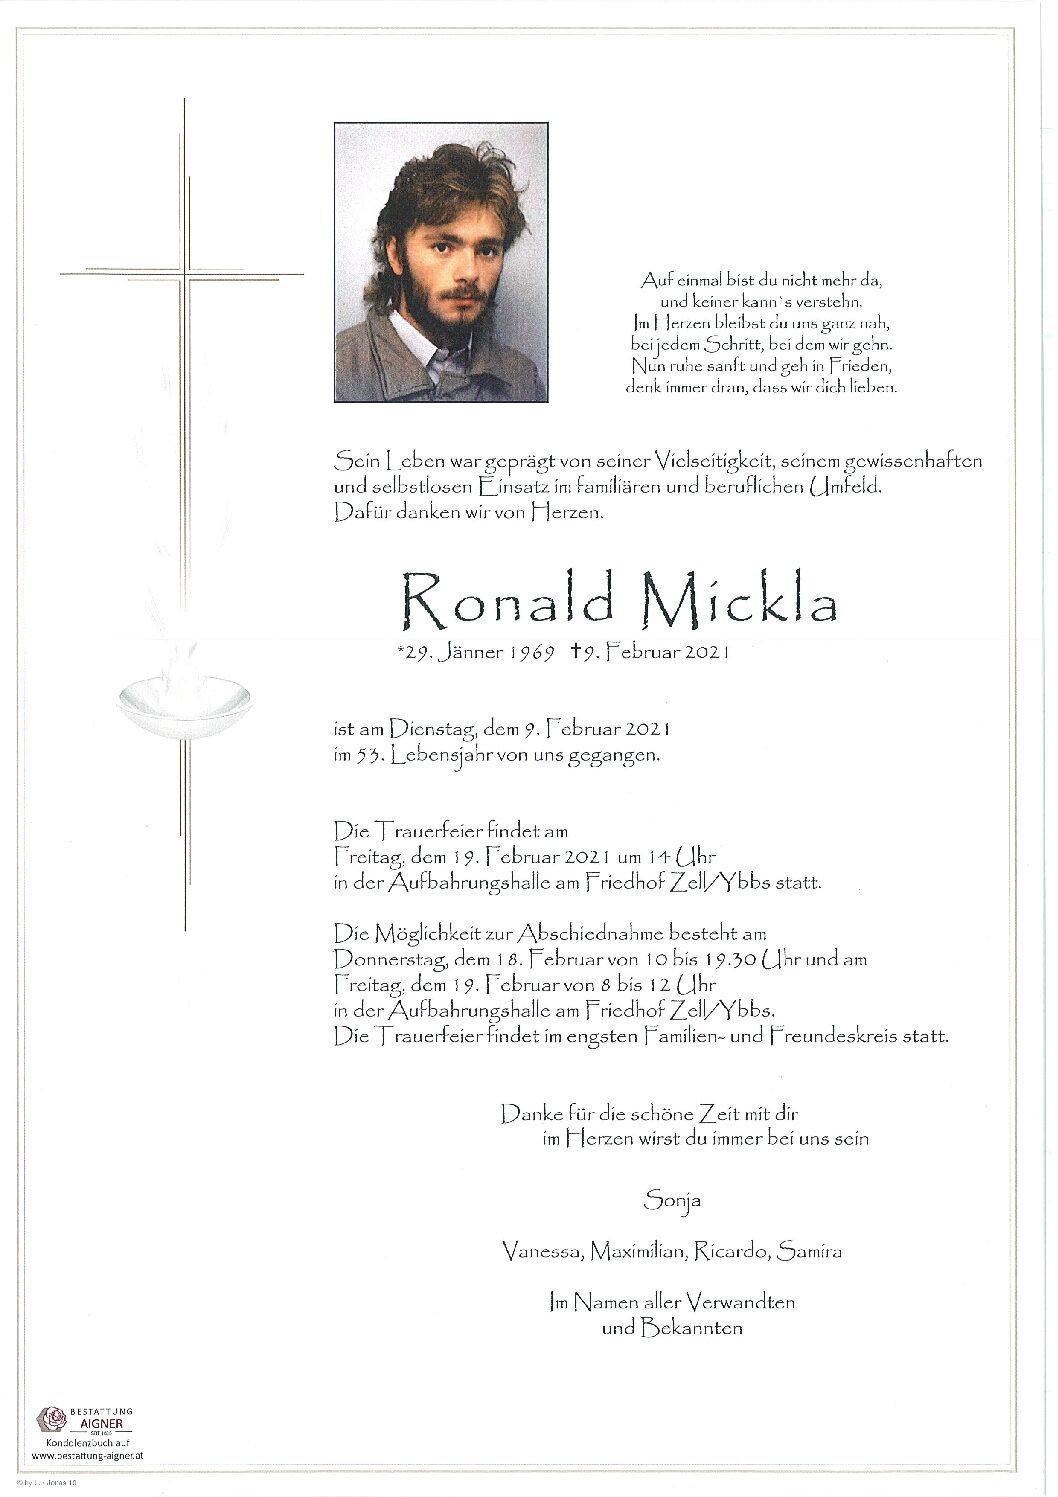 Ronald Mickla